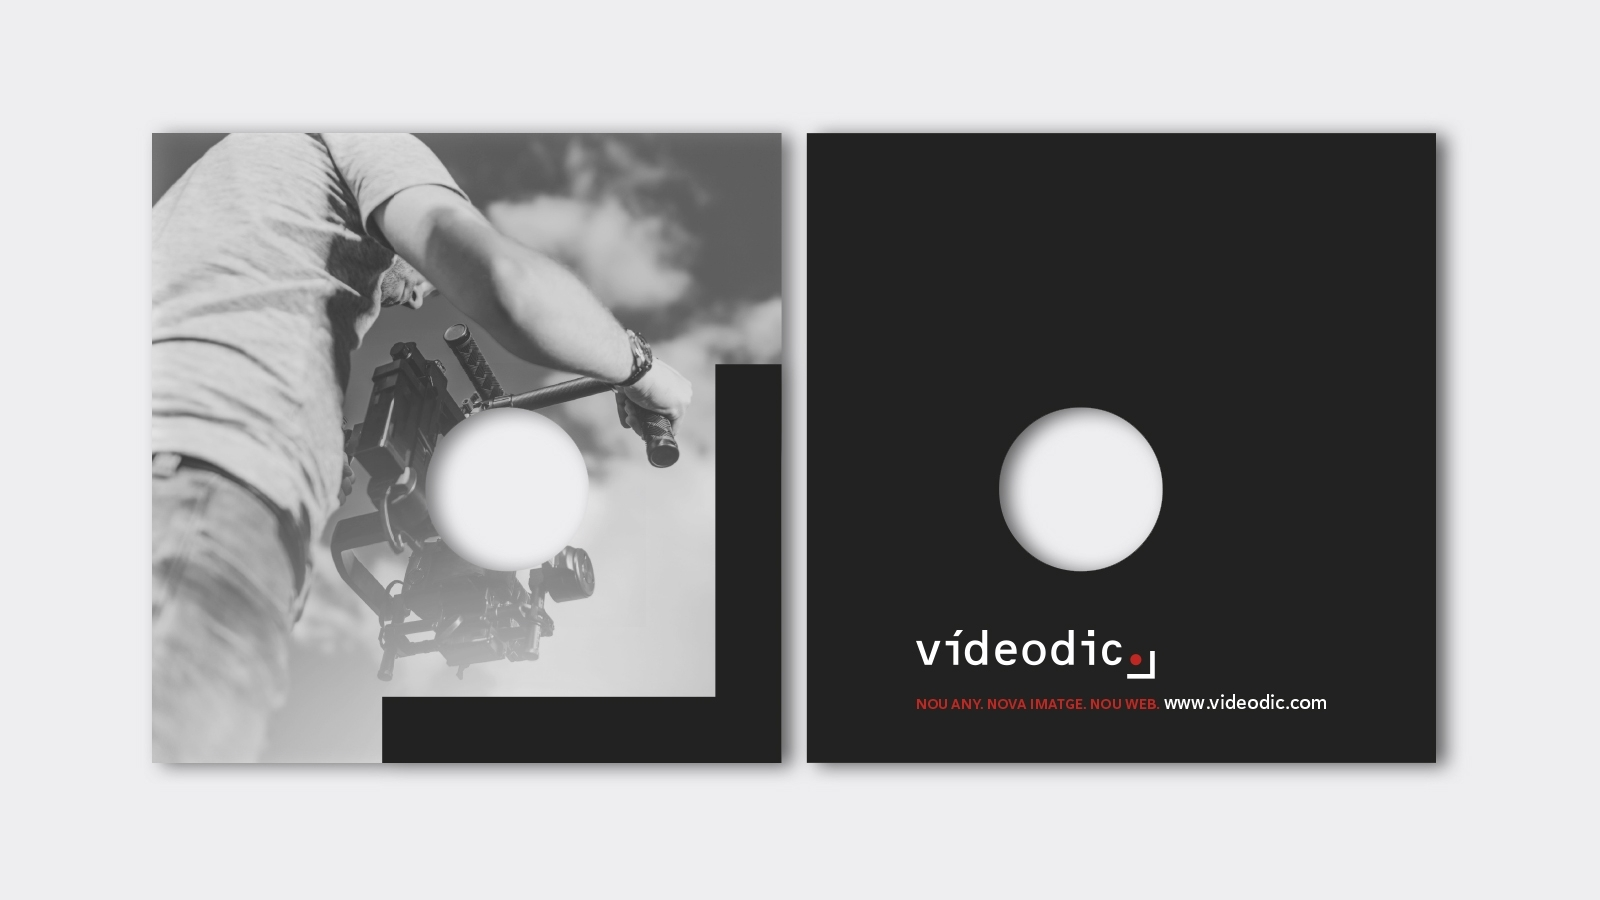 targeto-video-dic